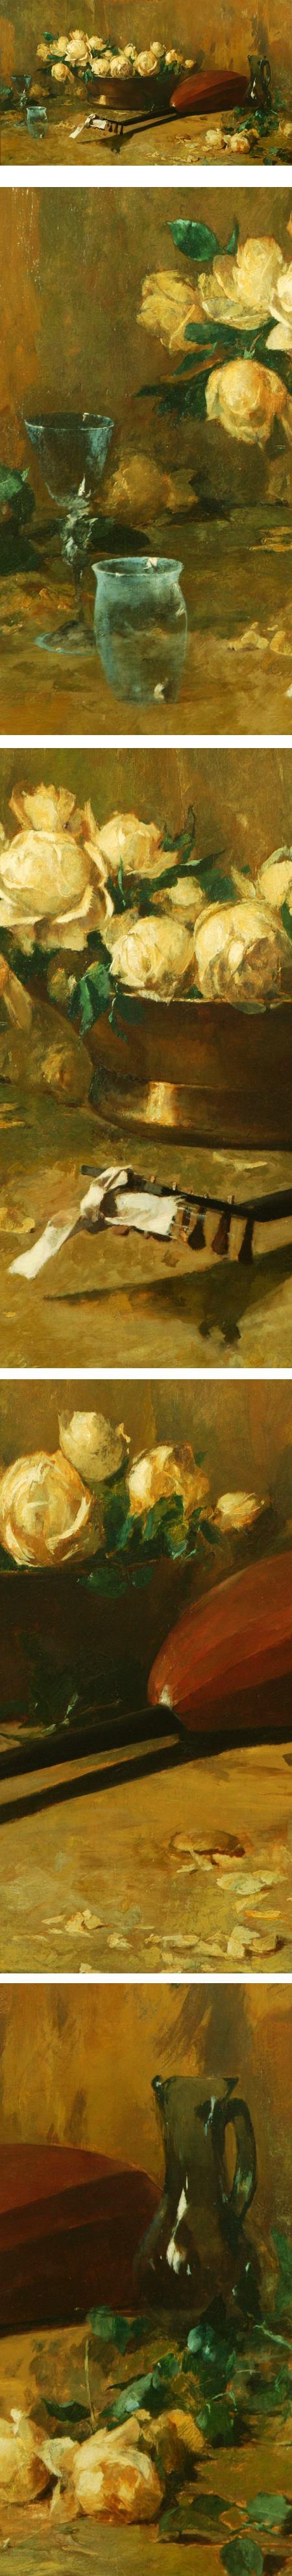 Still life with roses and mandolin, Emil Carlsen